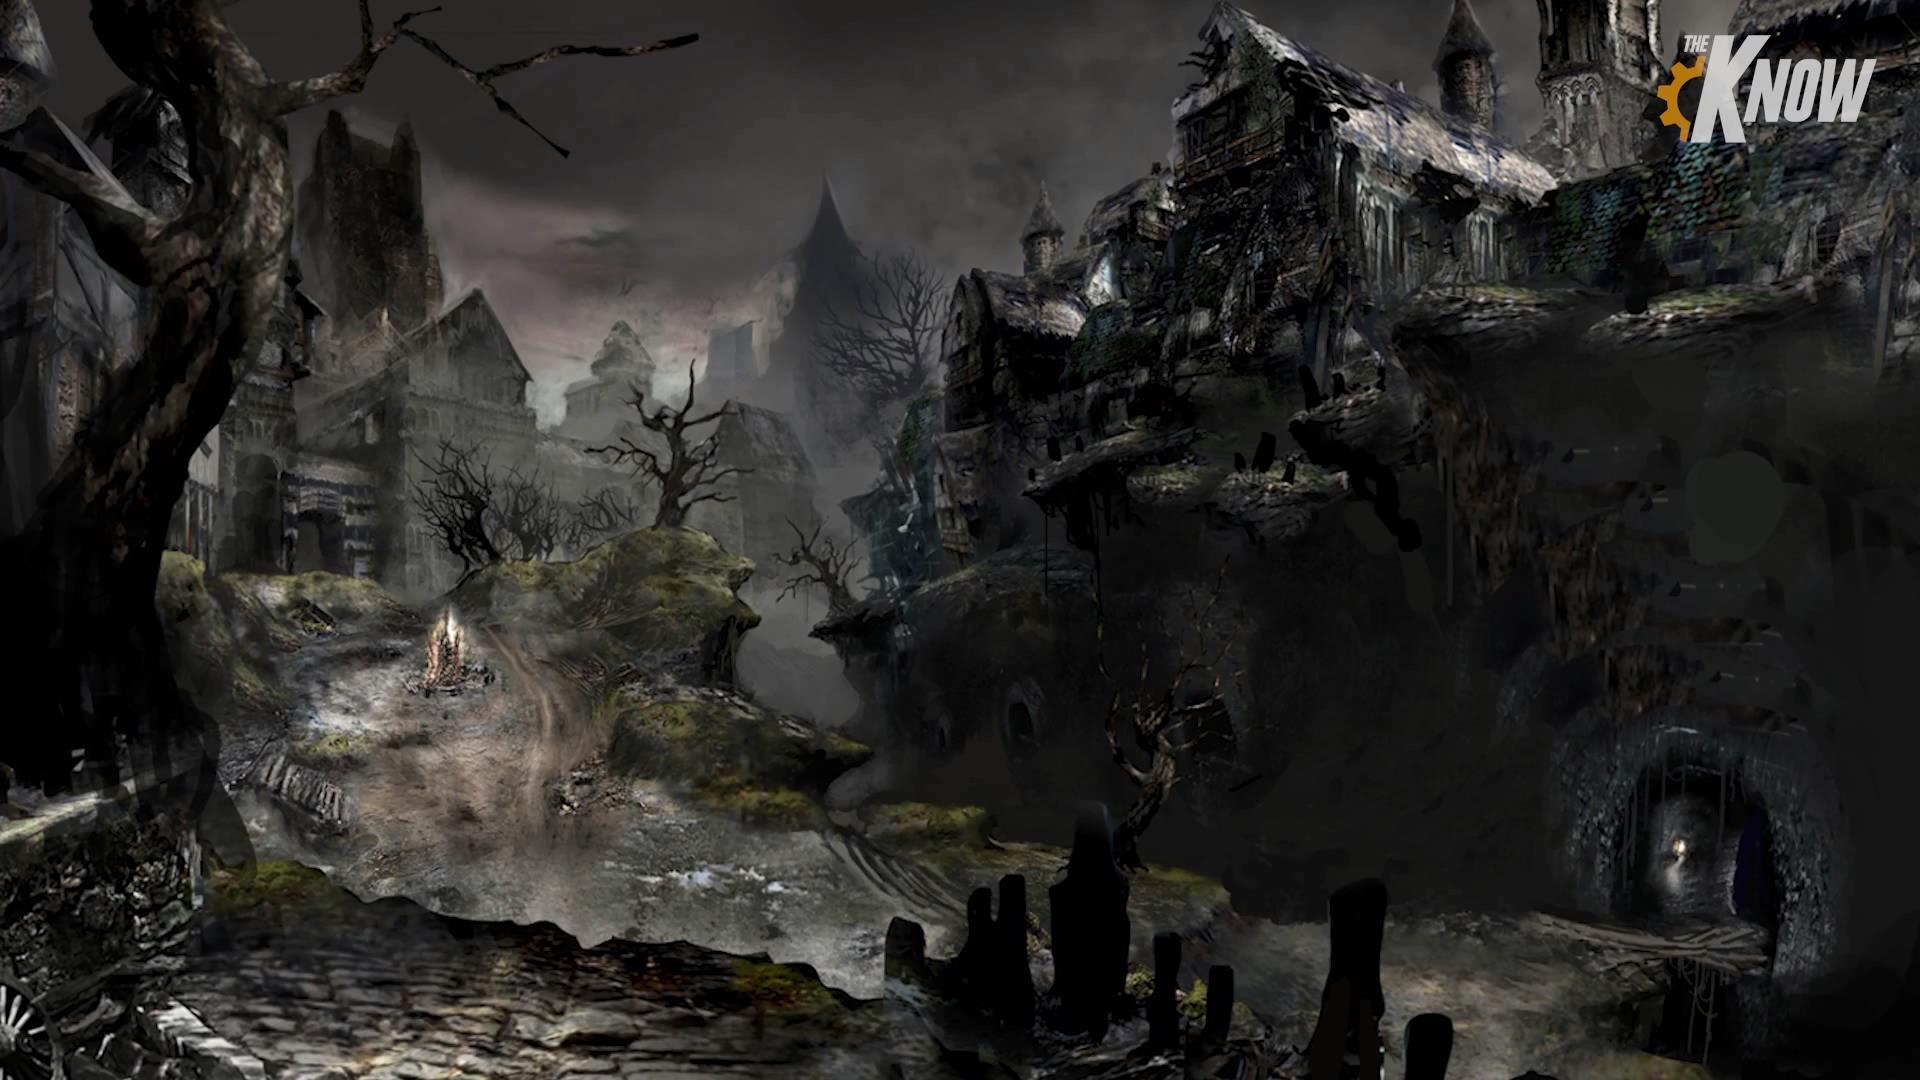 Dark Souls III   Key Art Screenshot 05   Full HD   1920x1080   Select 1920x1080